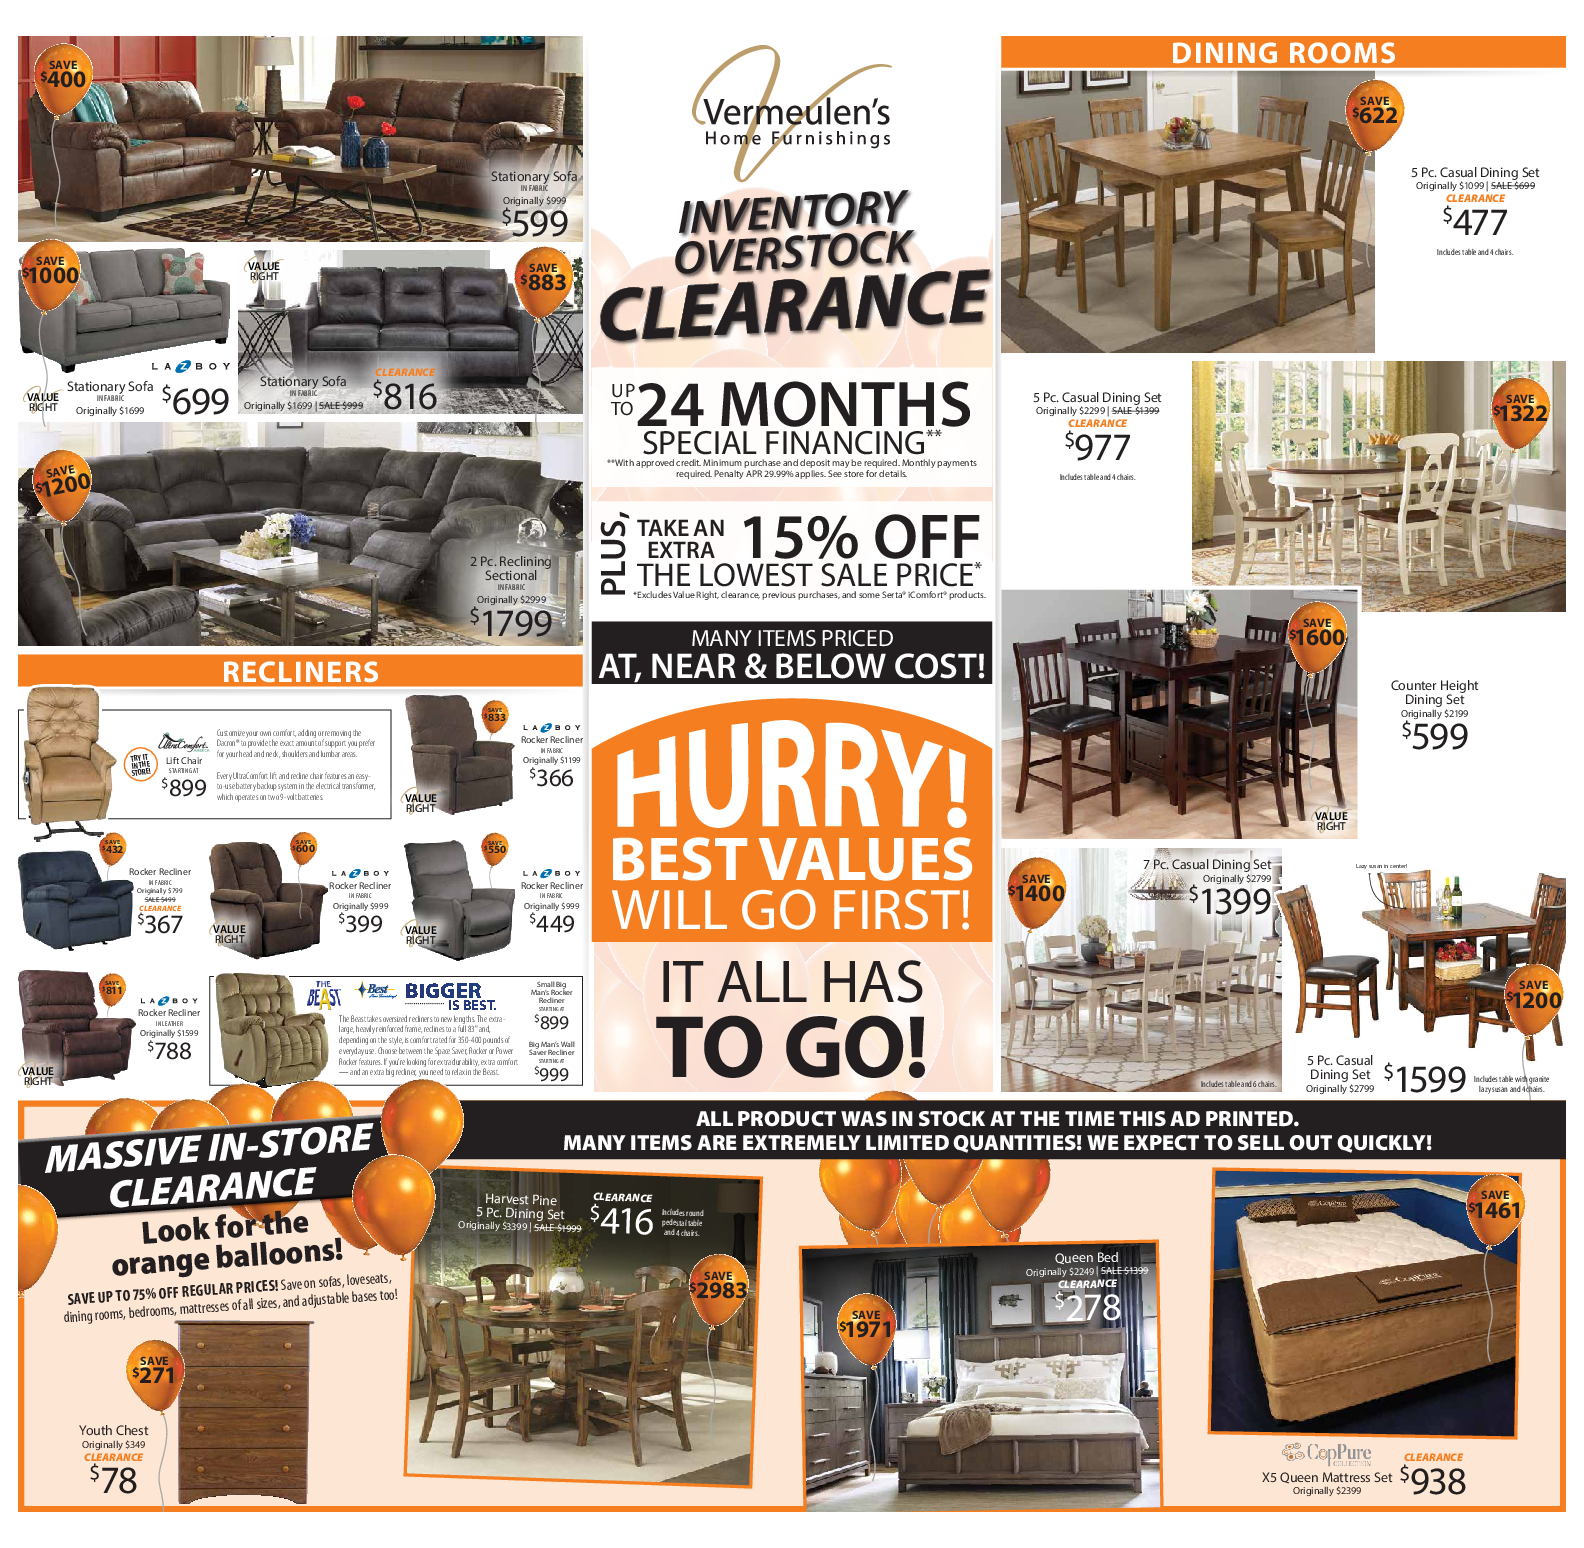 VERM-9021-18122-InventoryOverstock-Specials Page